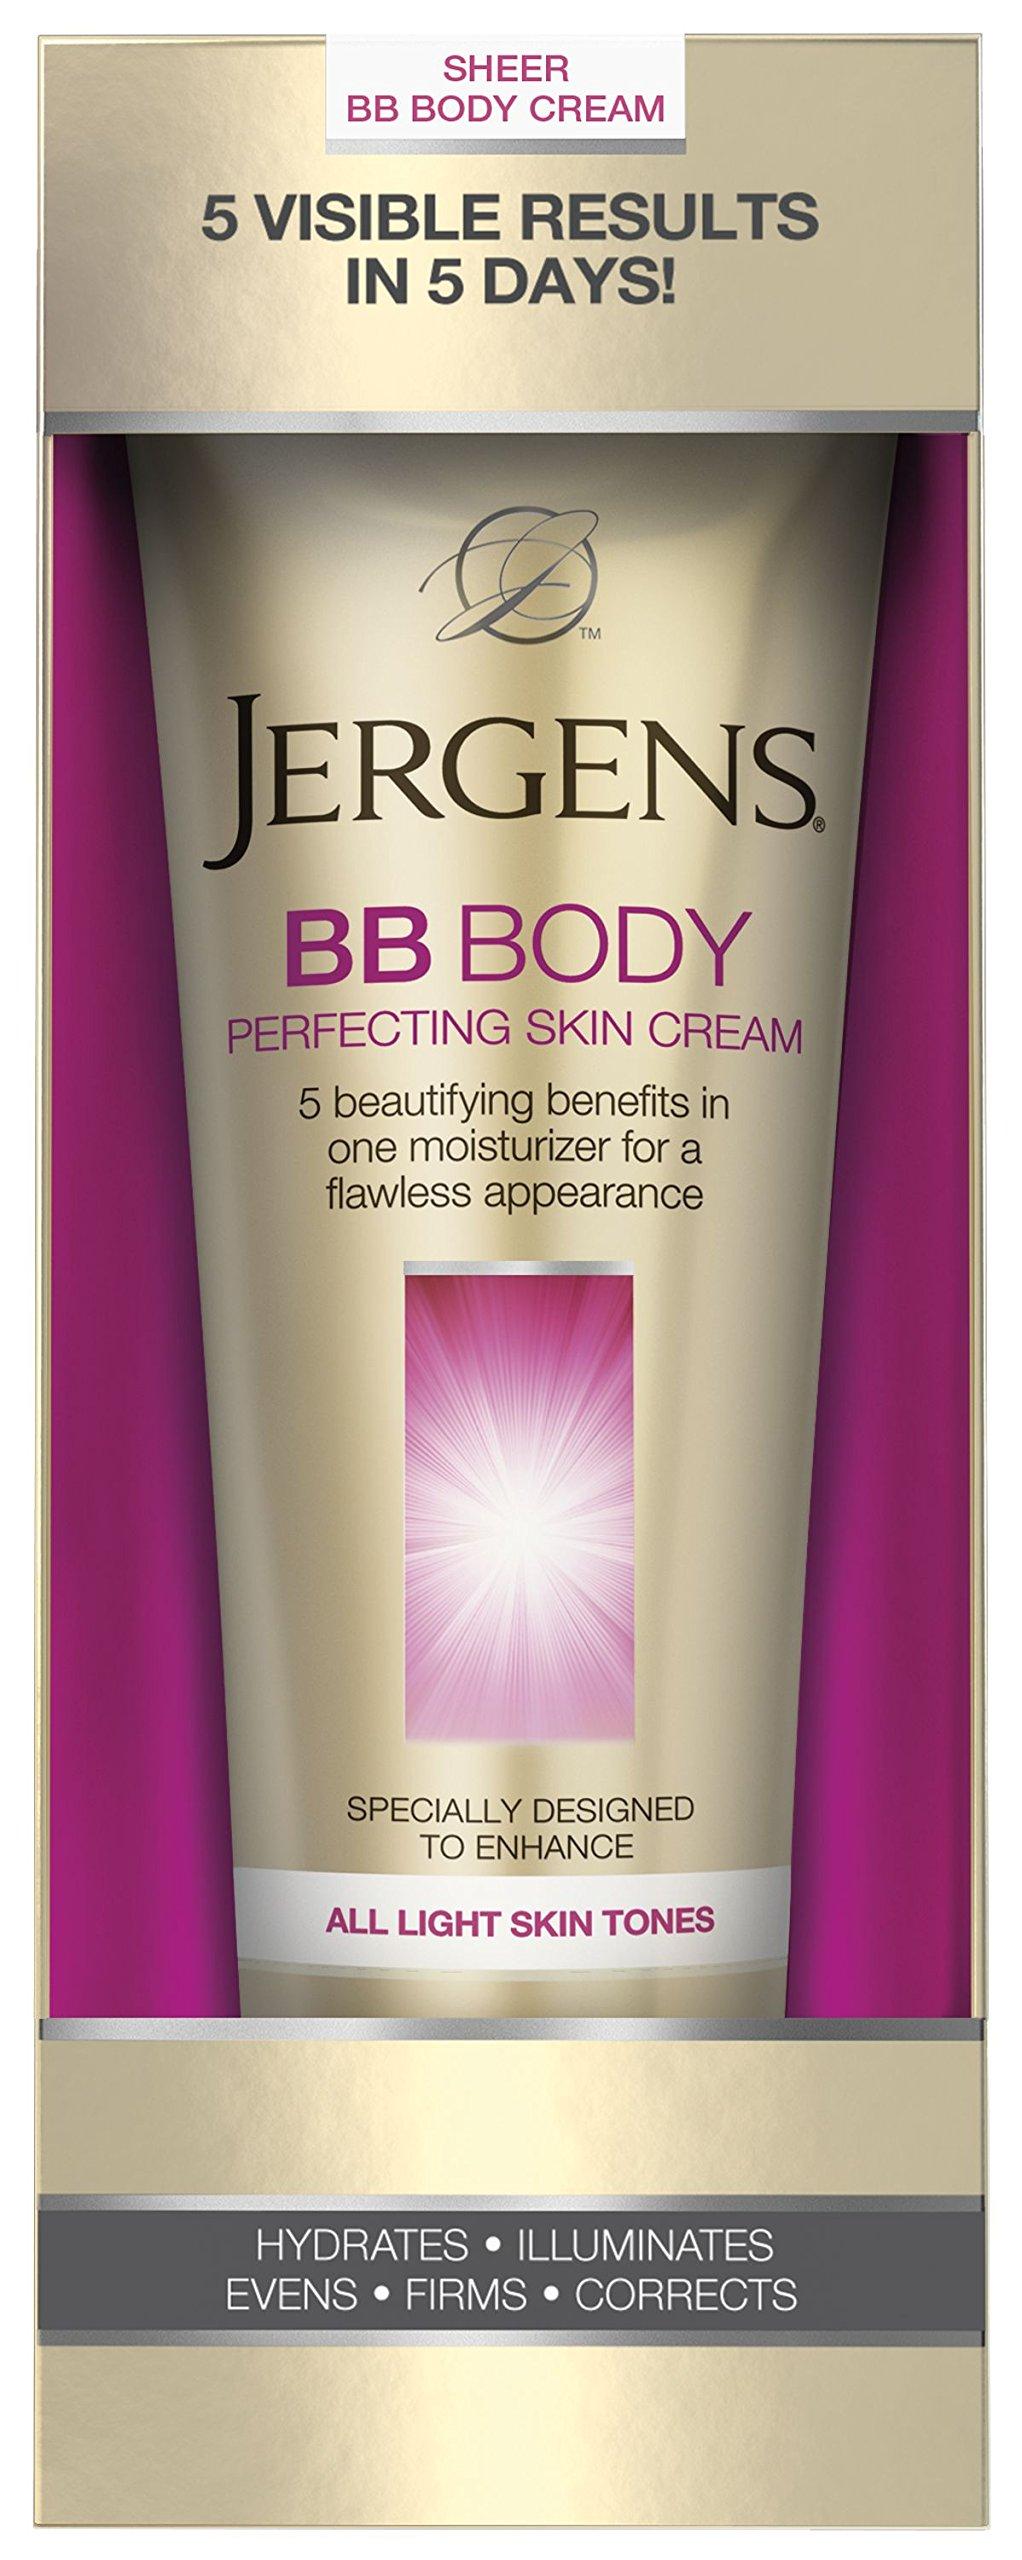 Jergens BB Body Perfecting Skin Cream, All Light Skin Tones, 7.5 Ounces